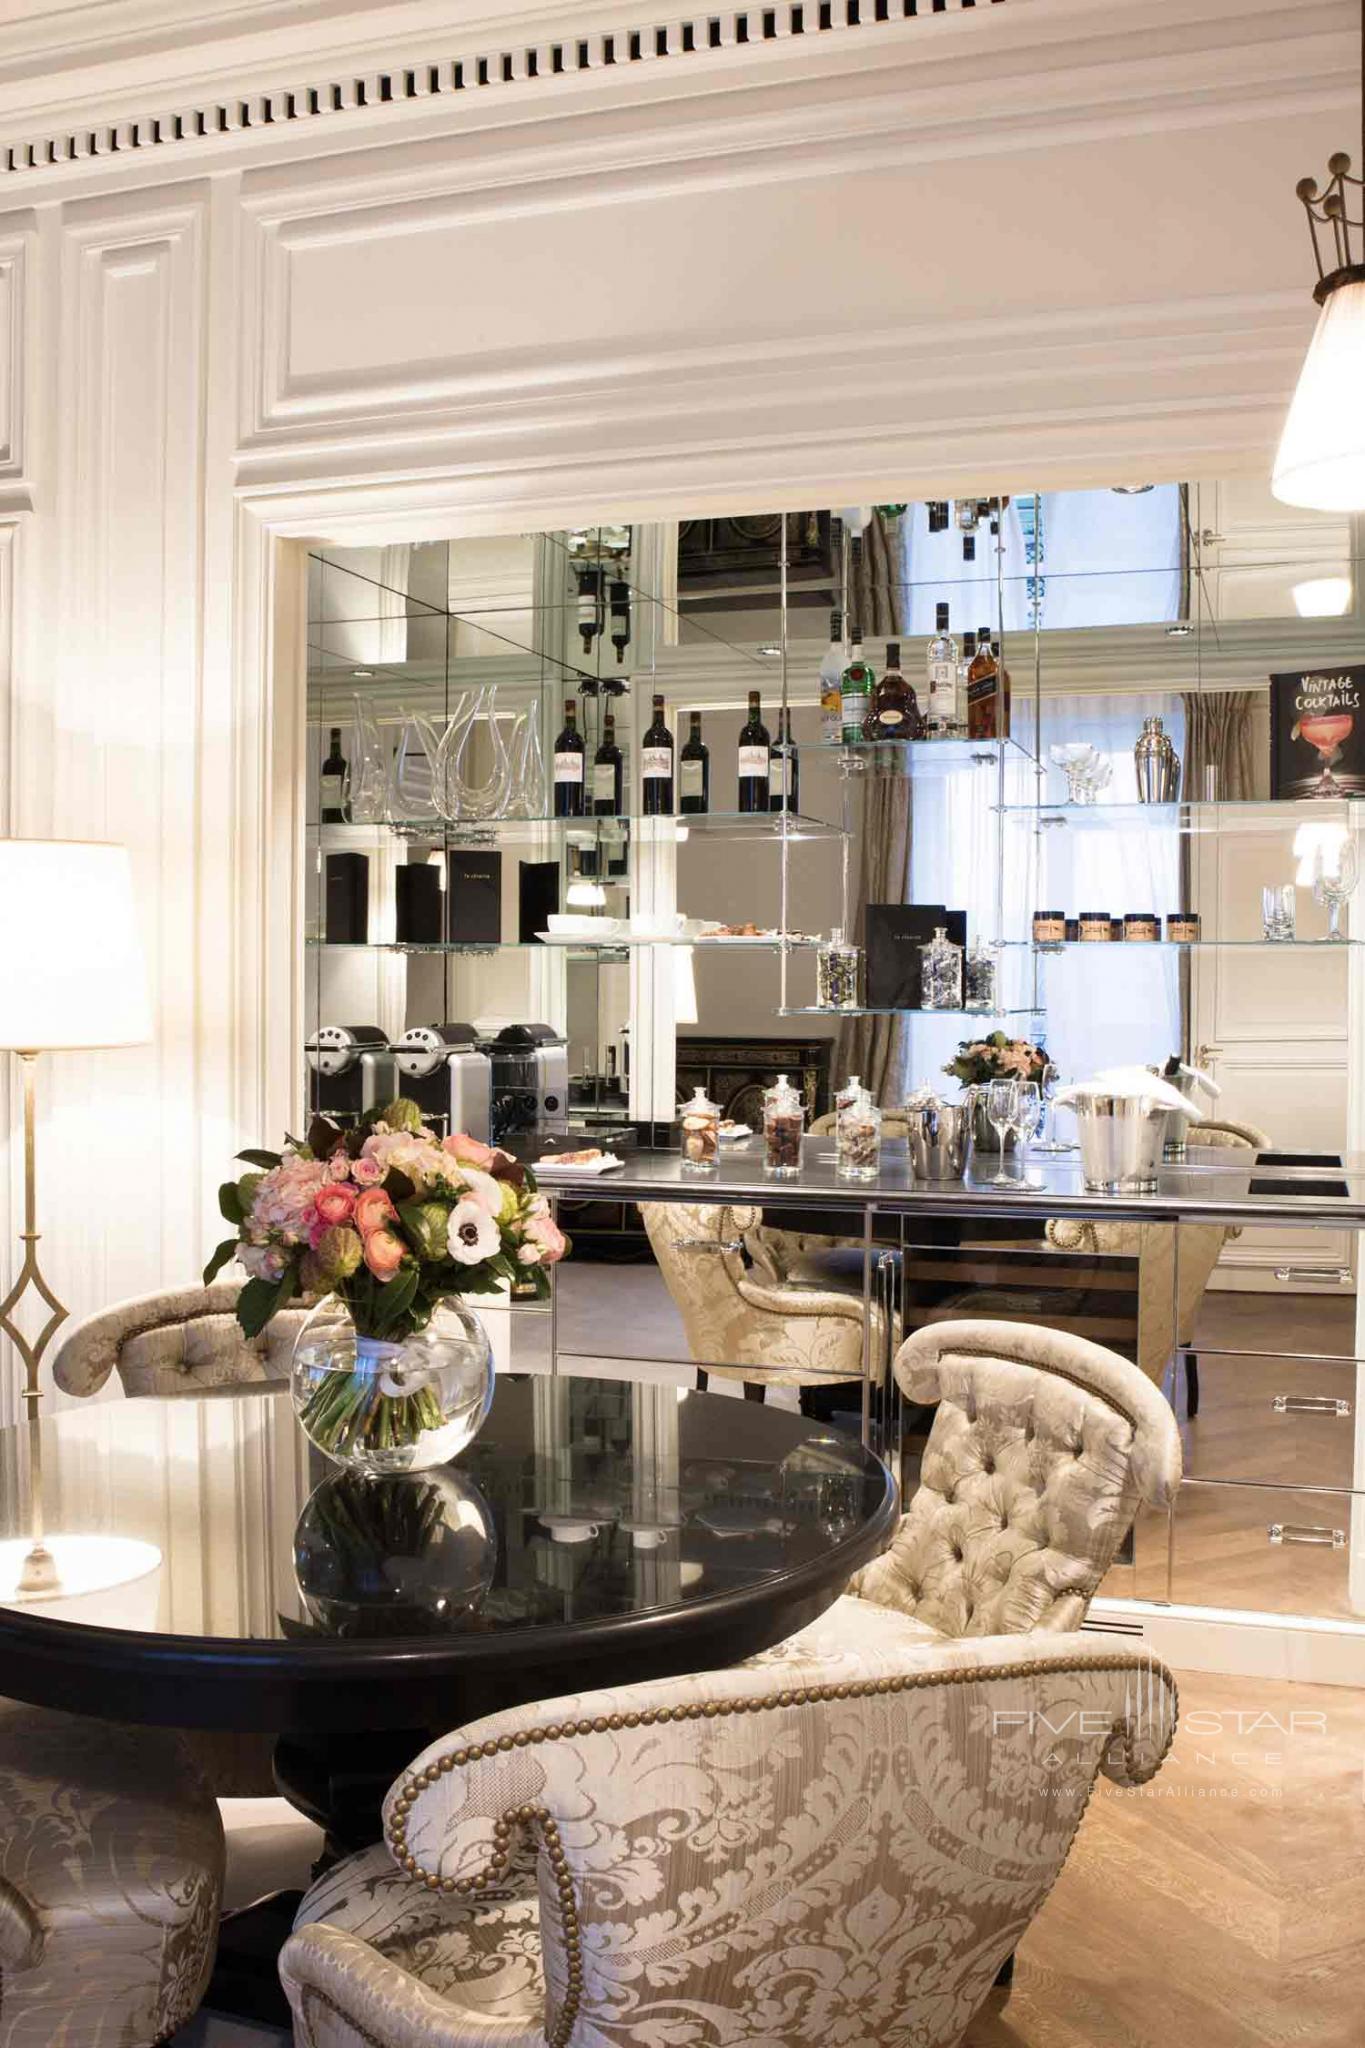 La Reserve Paris Hotel and Spa